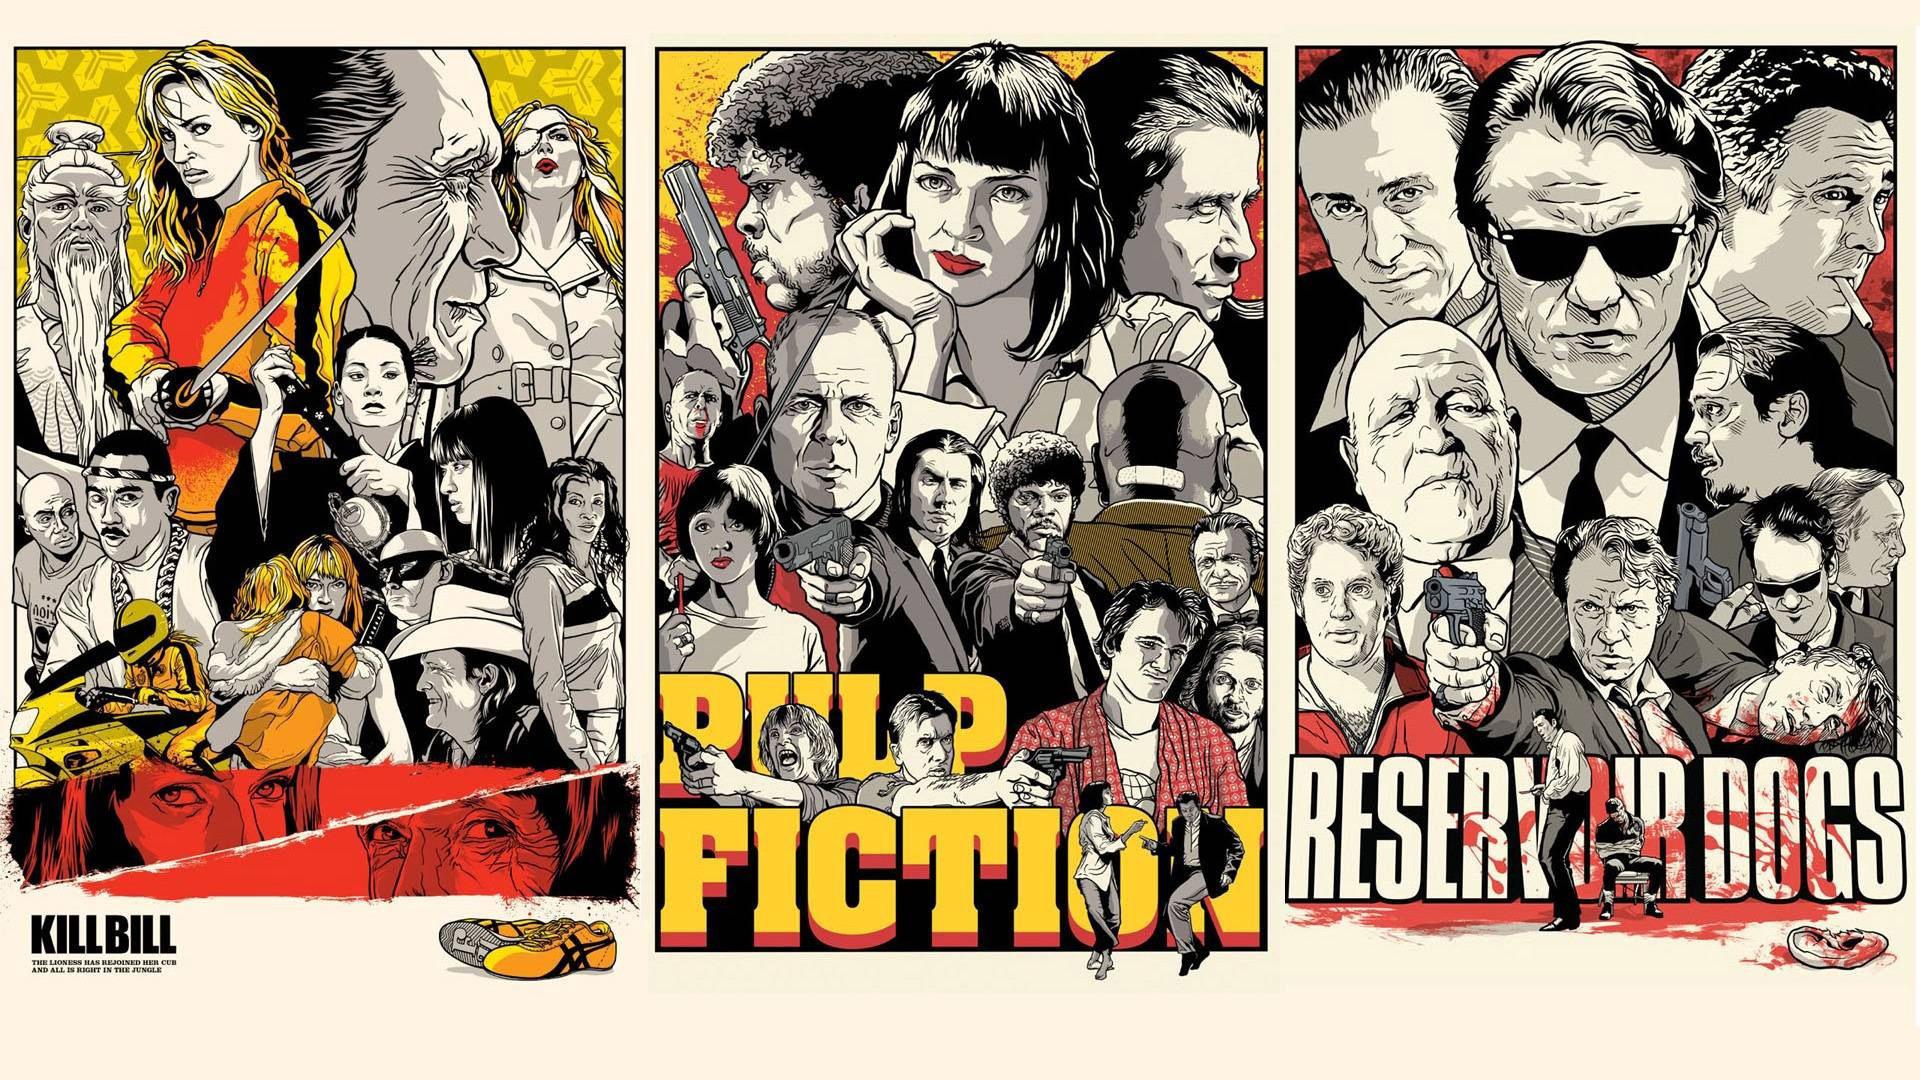 Fantastic Wallpaper Movie Collage - illustration-collage-cartoon-Pulp-Fiction-comics-poster-Quentin-Tarantino-Kill-Bill-Reservoir-Dogs-ART-album-cover-comic-book-photomontage-576800  Photograph_74421.jpg